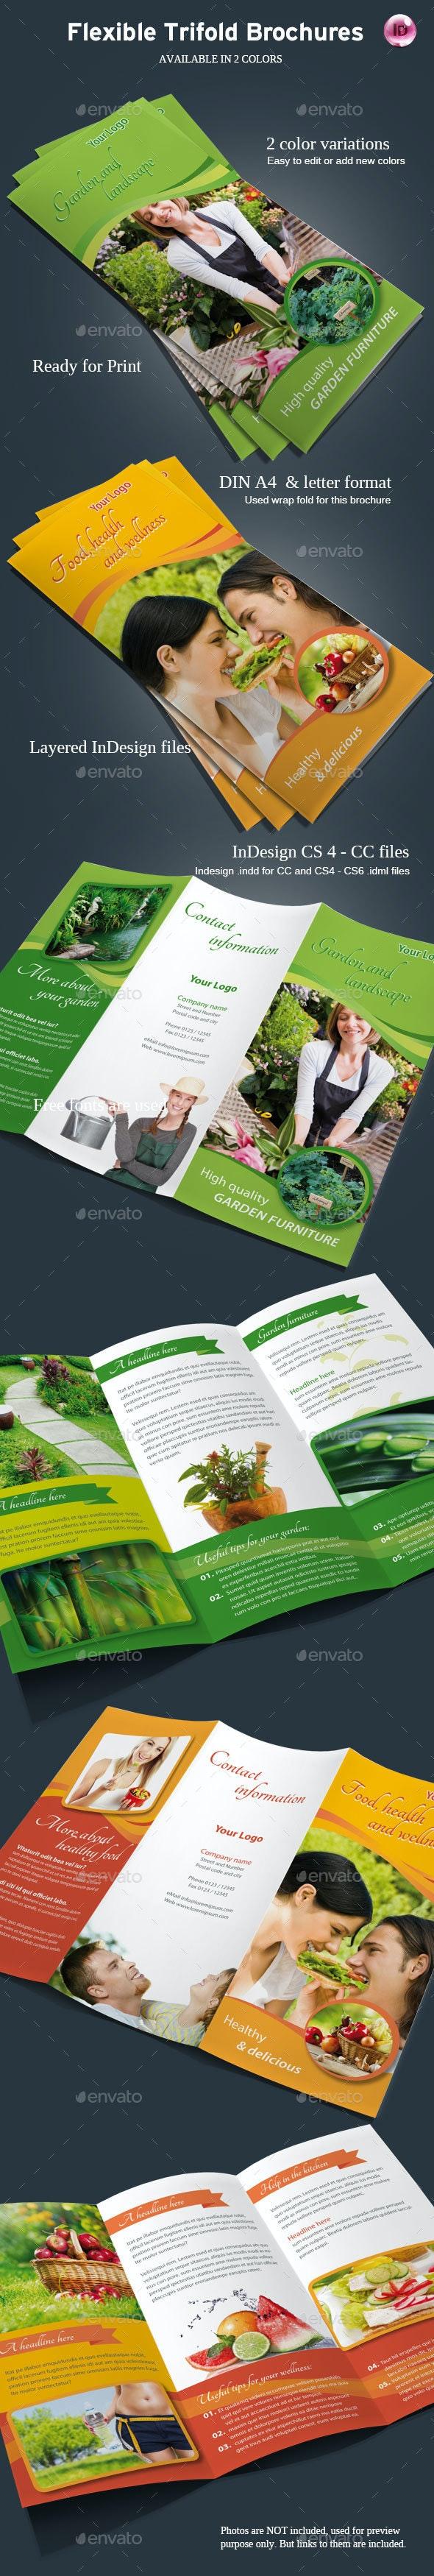 Flexible TriFold Brochure - Corporate Brochures